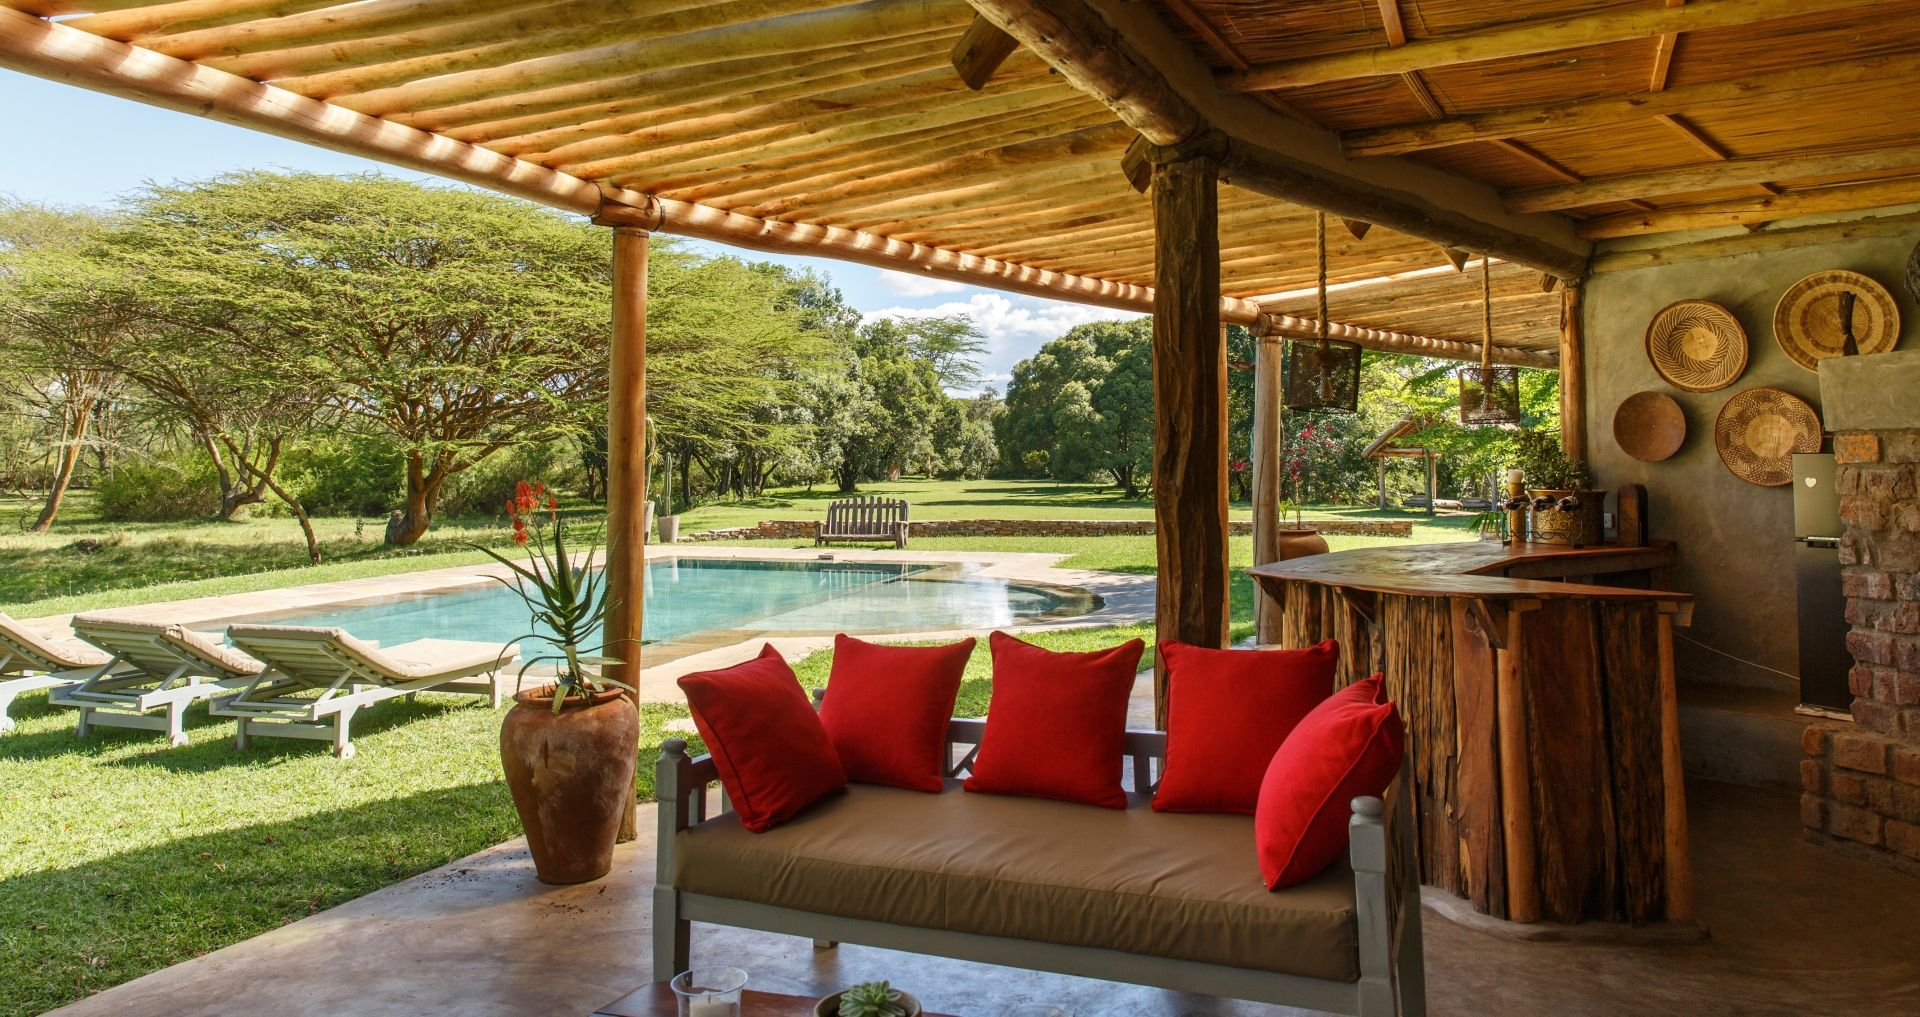 Wild Villa terrace and pool